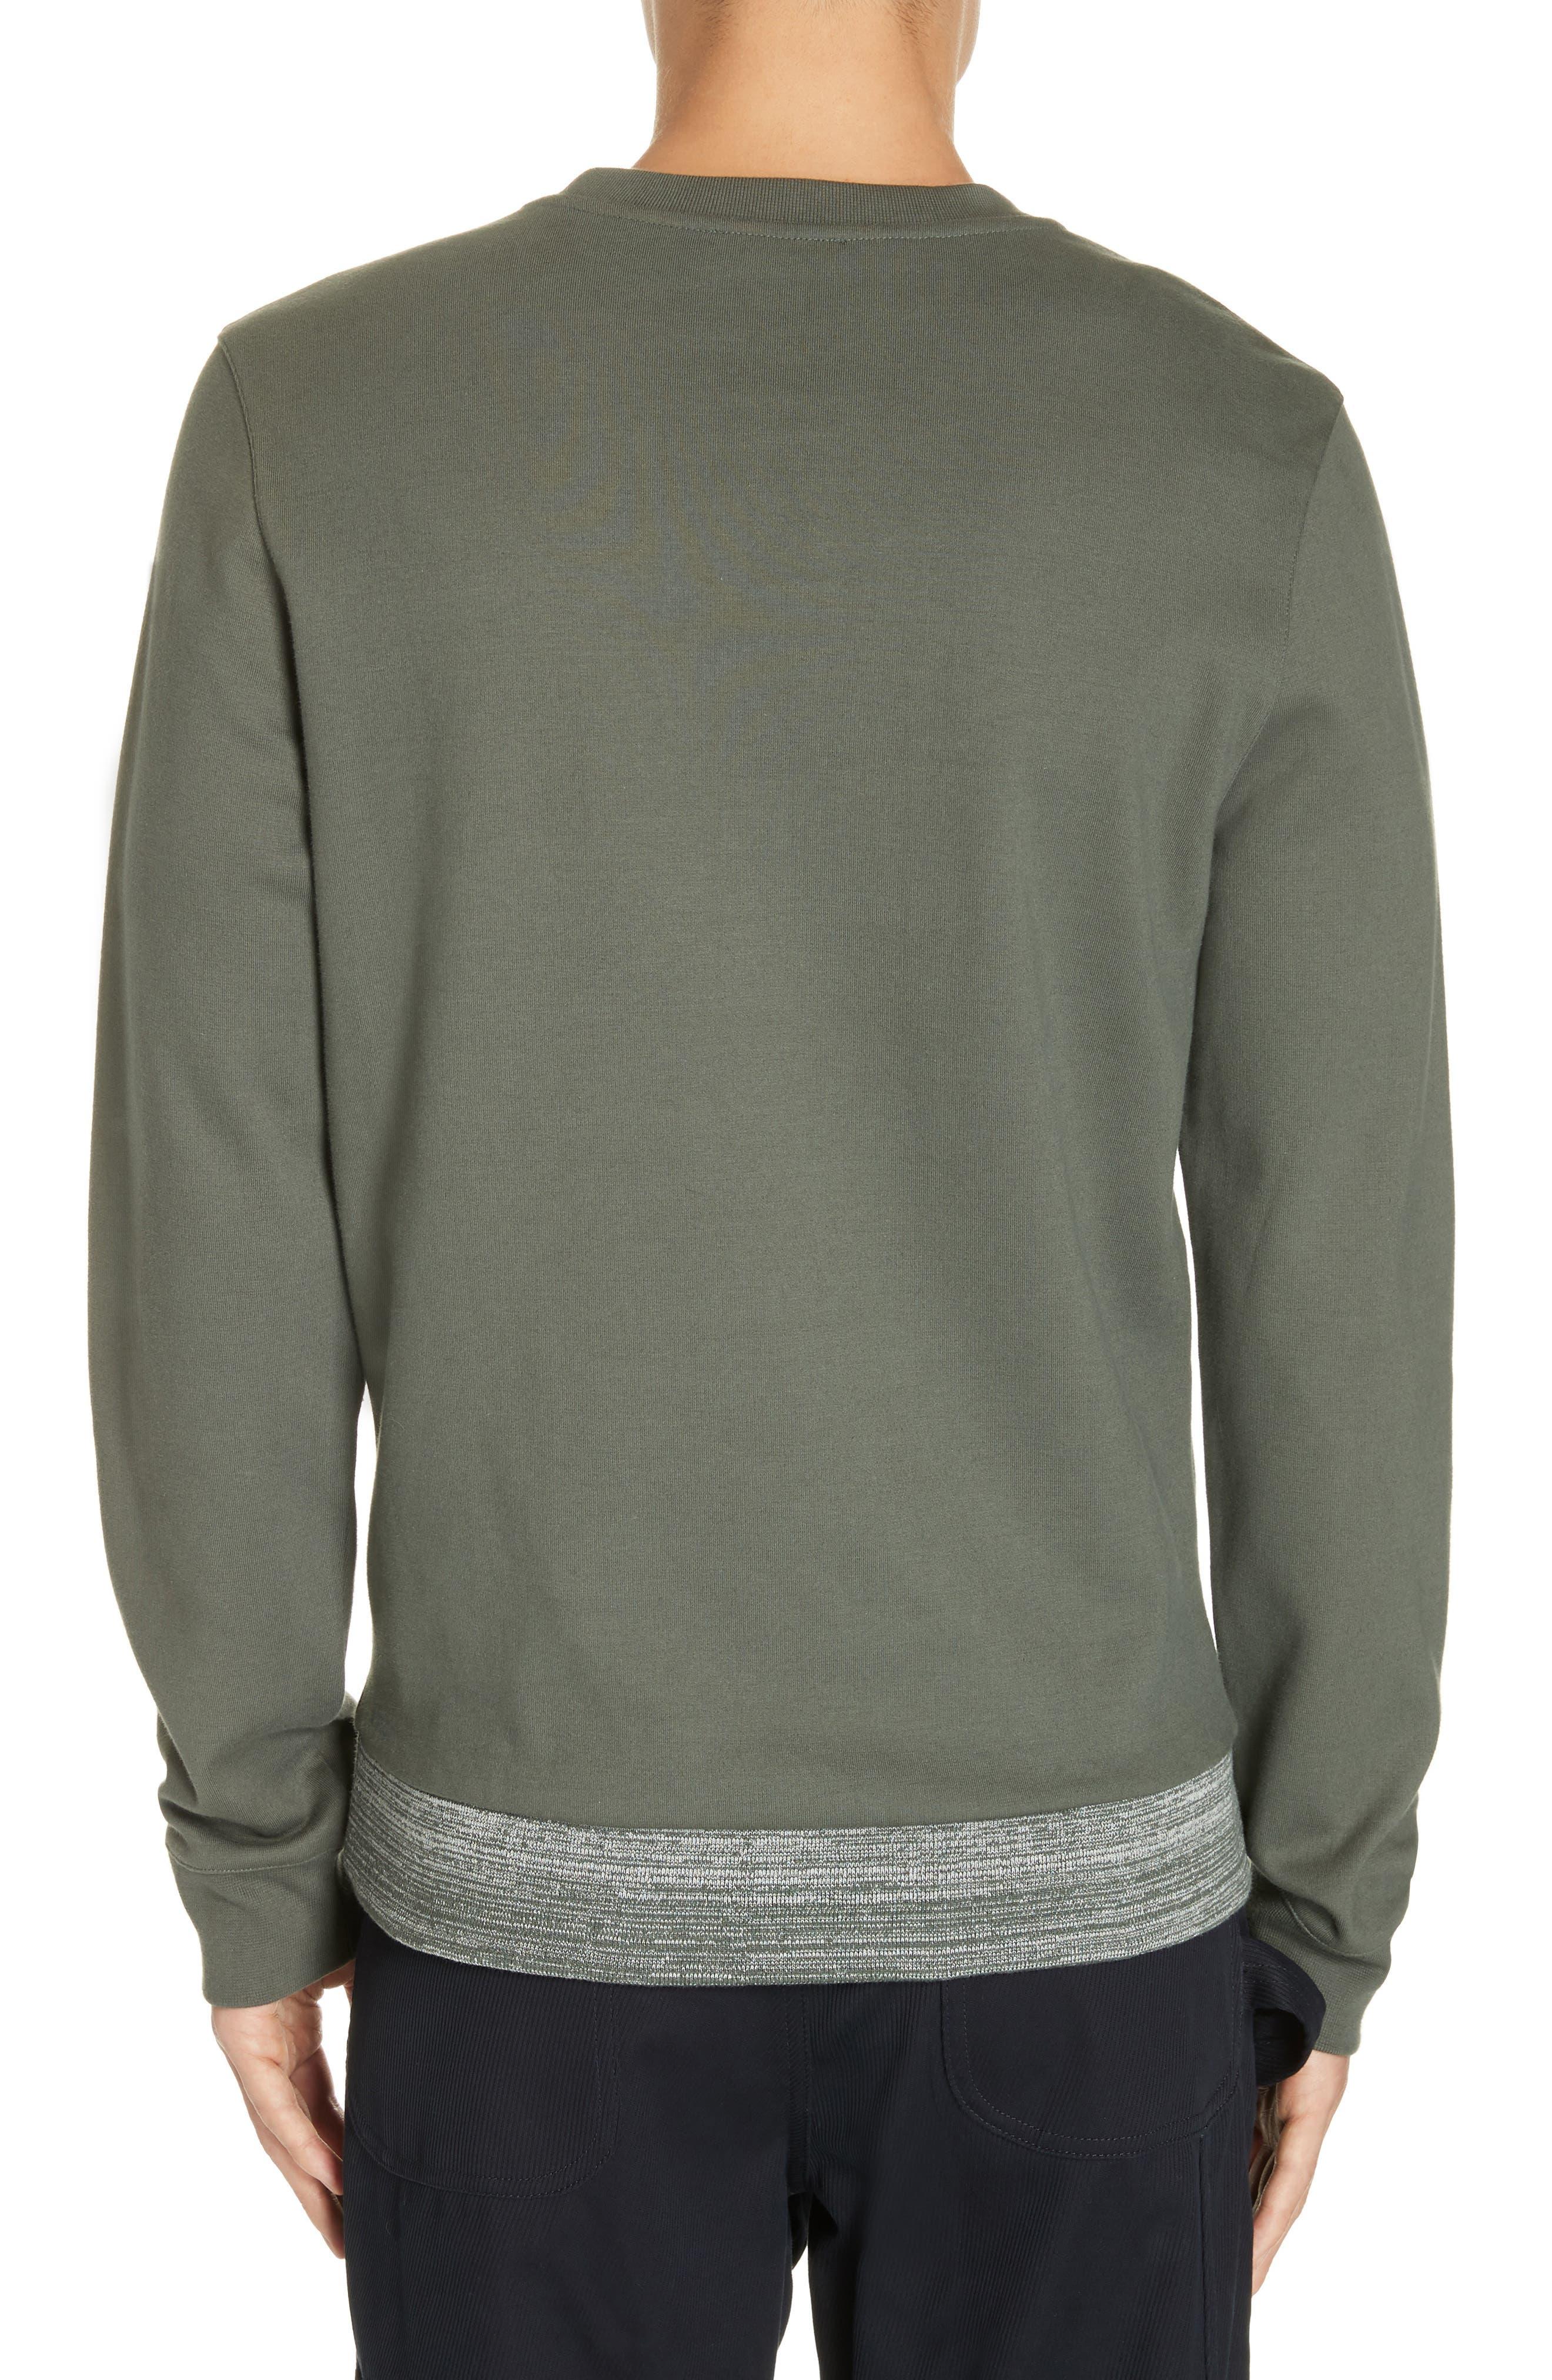 Jeremie Space Dye Sweatshirt,                             Alternate thumbnail 2, color,                             KHAKI